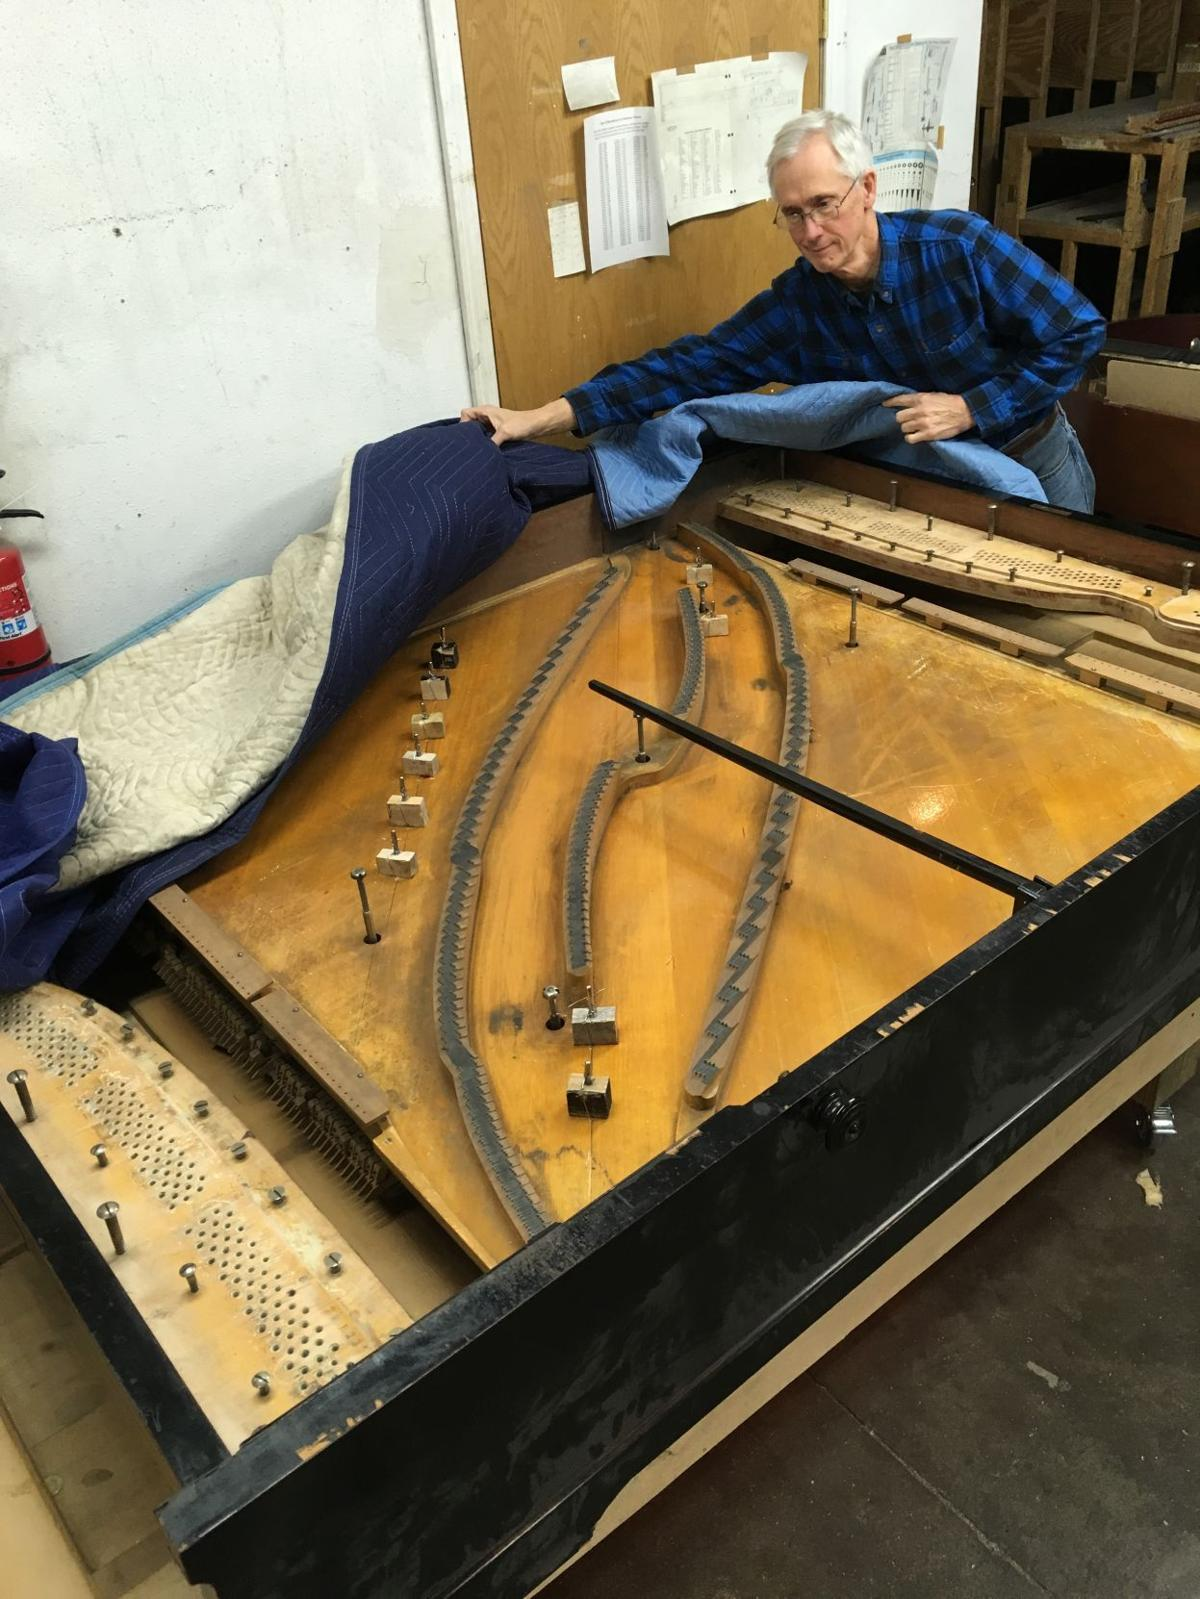 Pleyel double grand piano